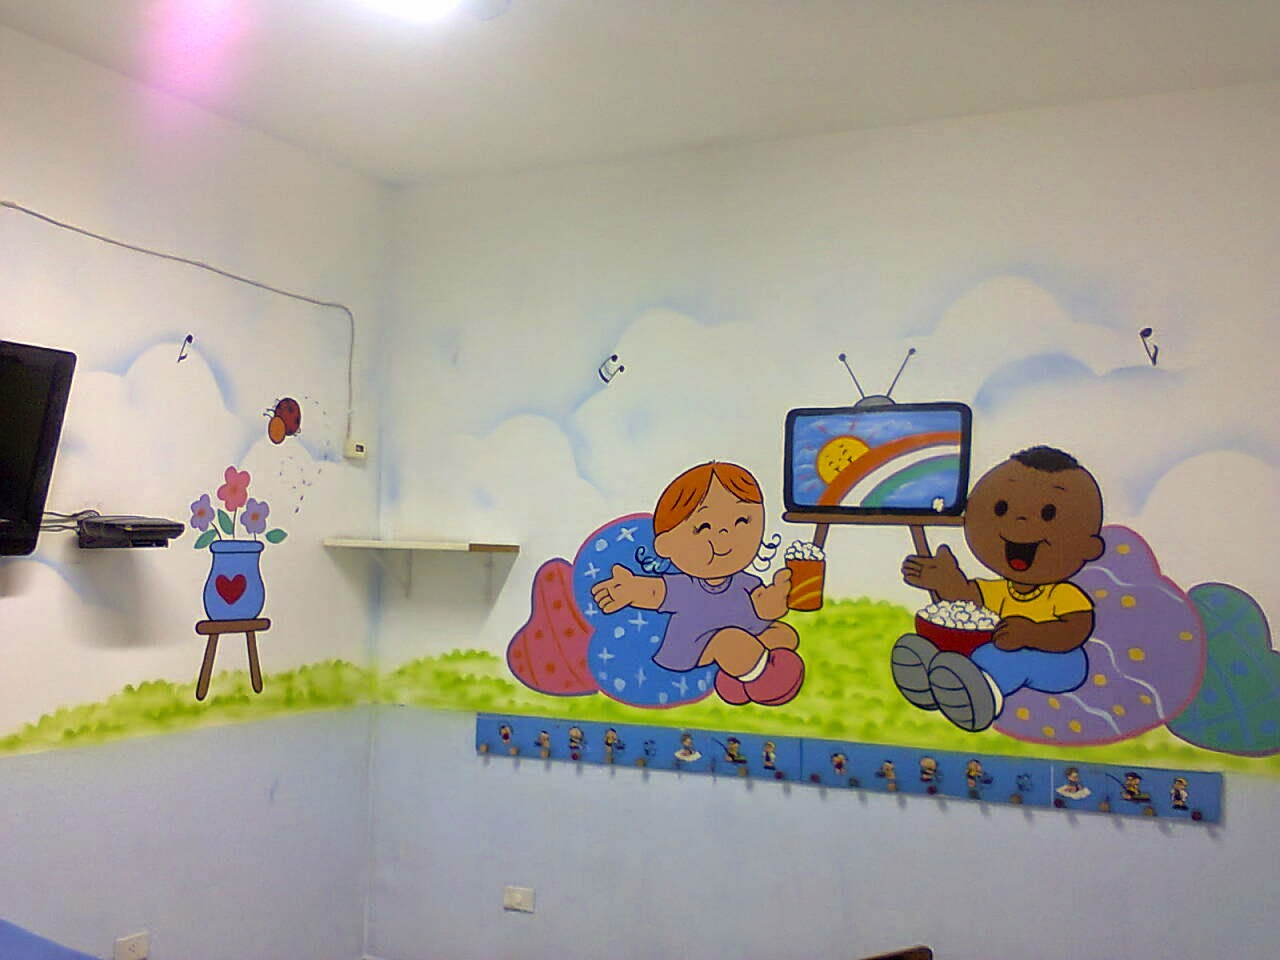 Decorao Sala De Aula Educao Infantil Placa De Identificao Para A  -> Decoracao Sala De Artes